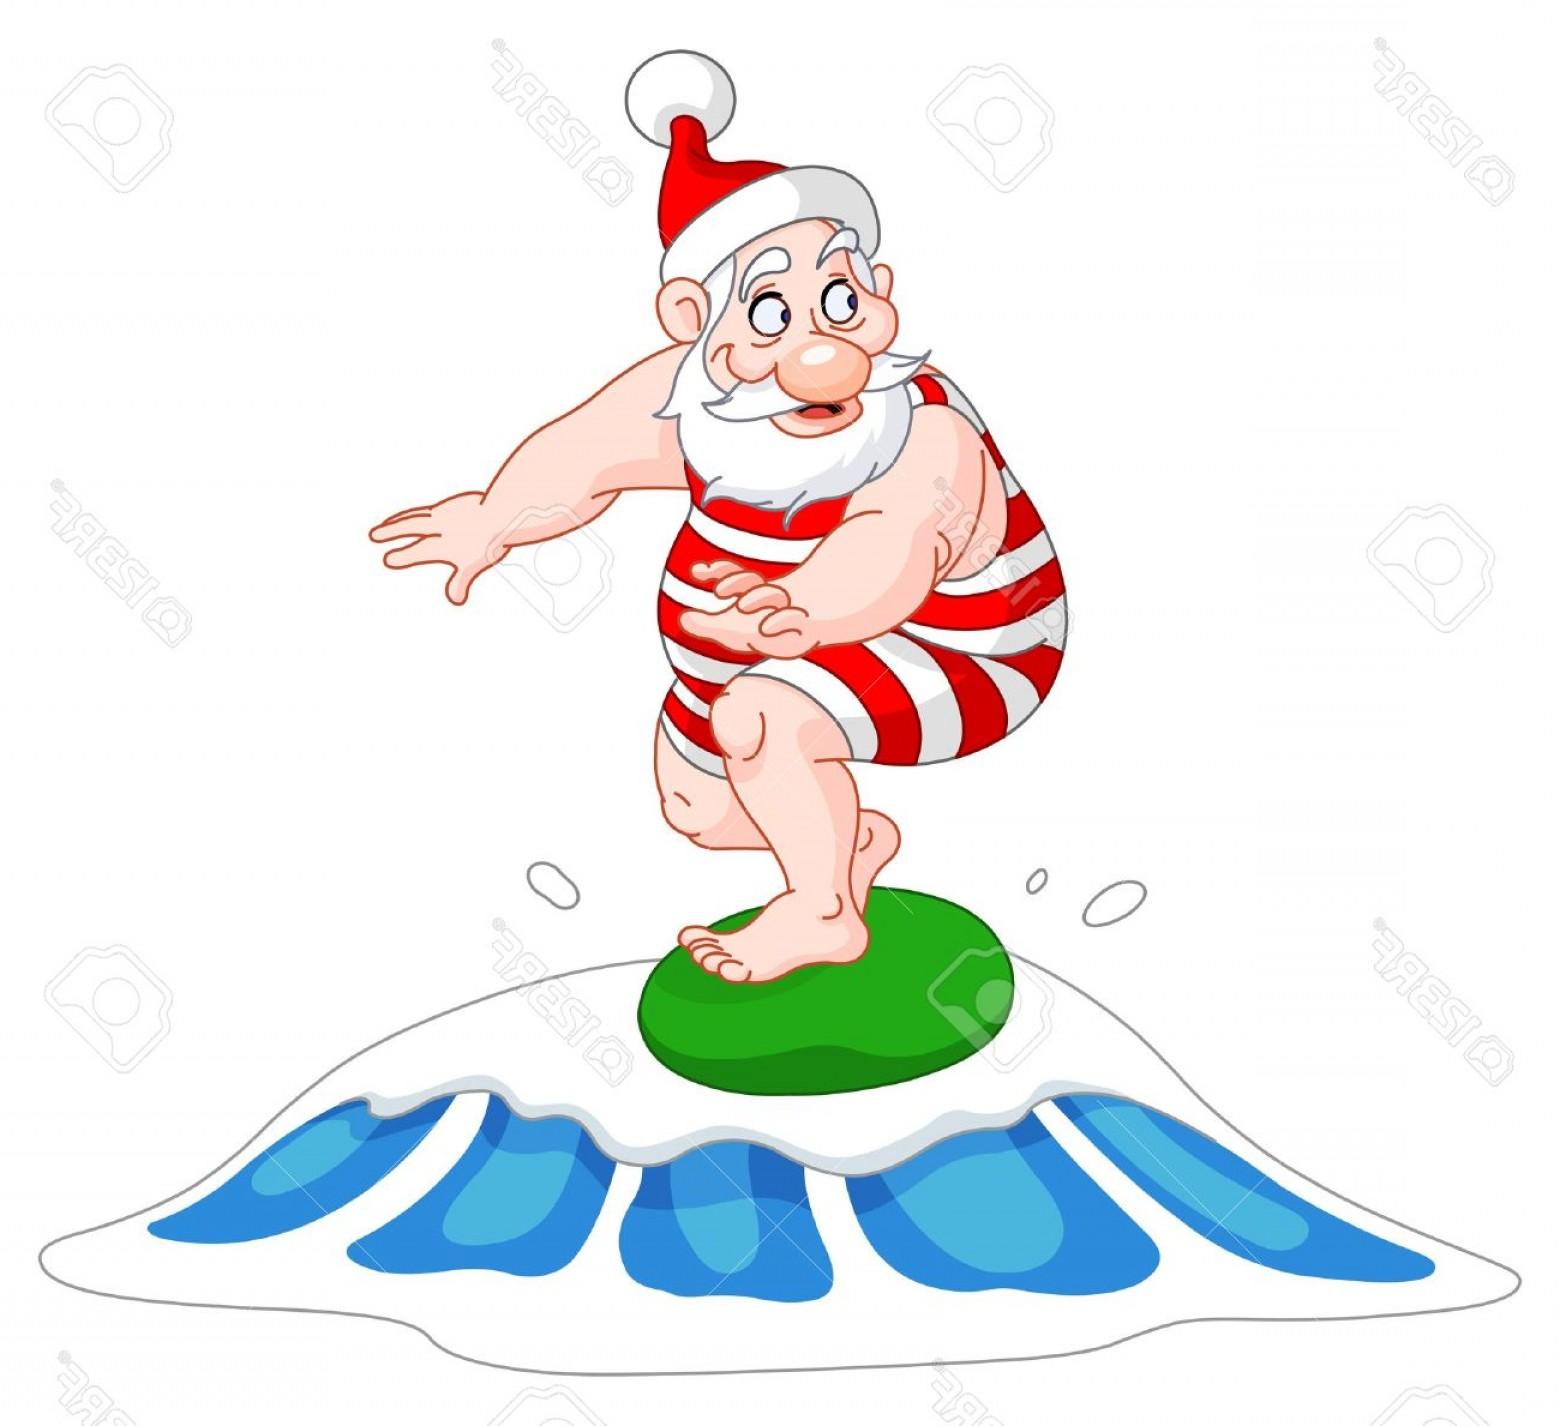 Surfing santa clipart transparent Surf Santa In Swimsuit Clipart Free | SOIDERGI transparent